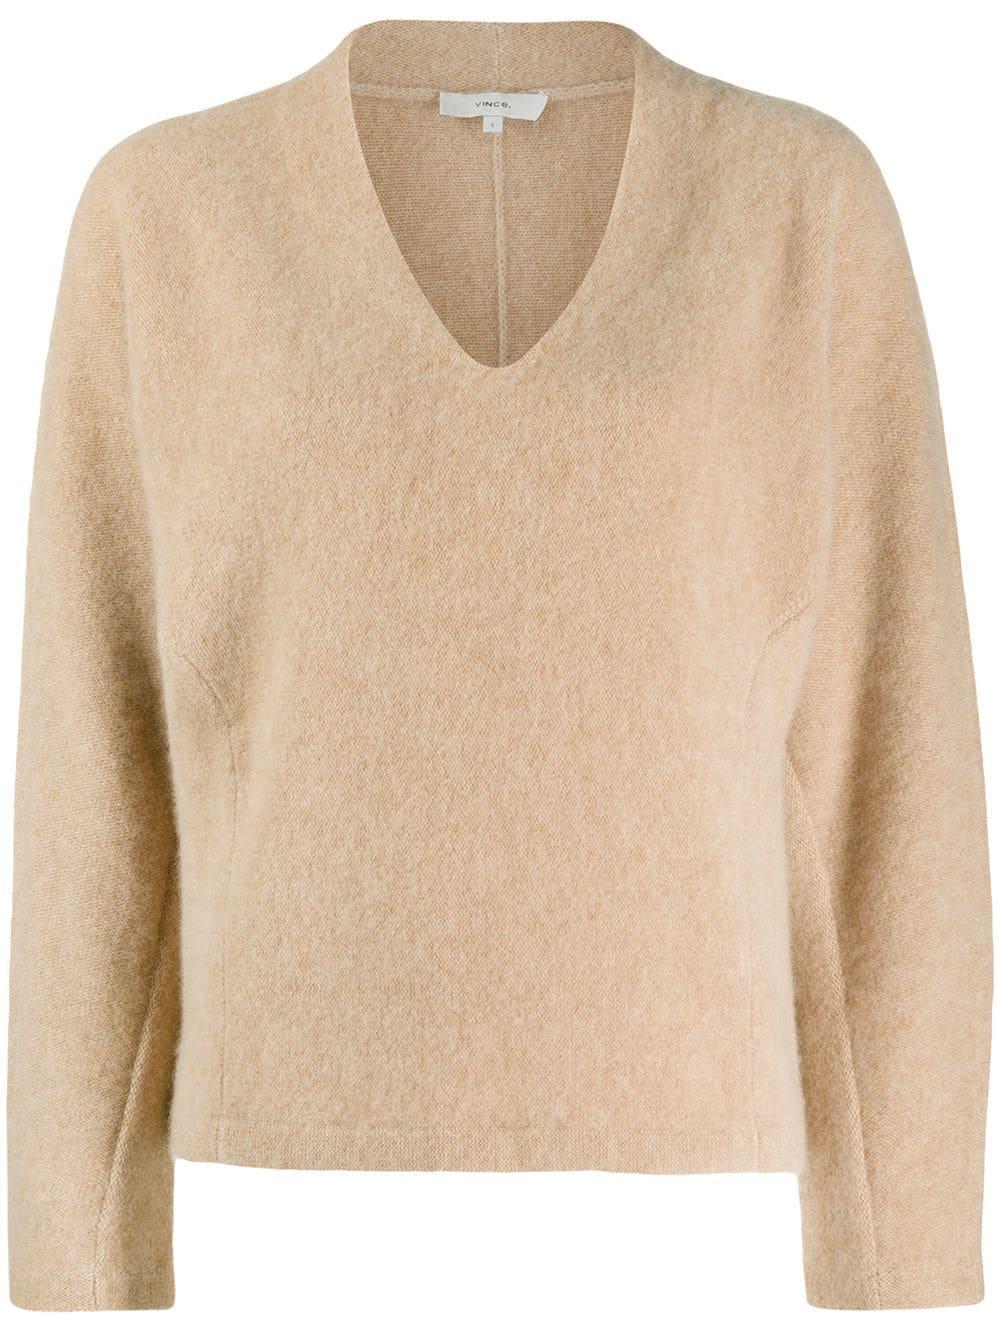 V Neck Dolman Sweater